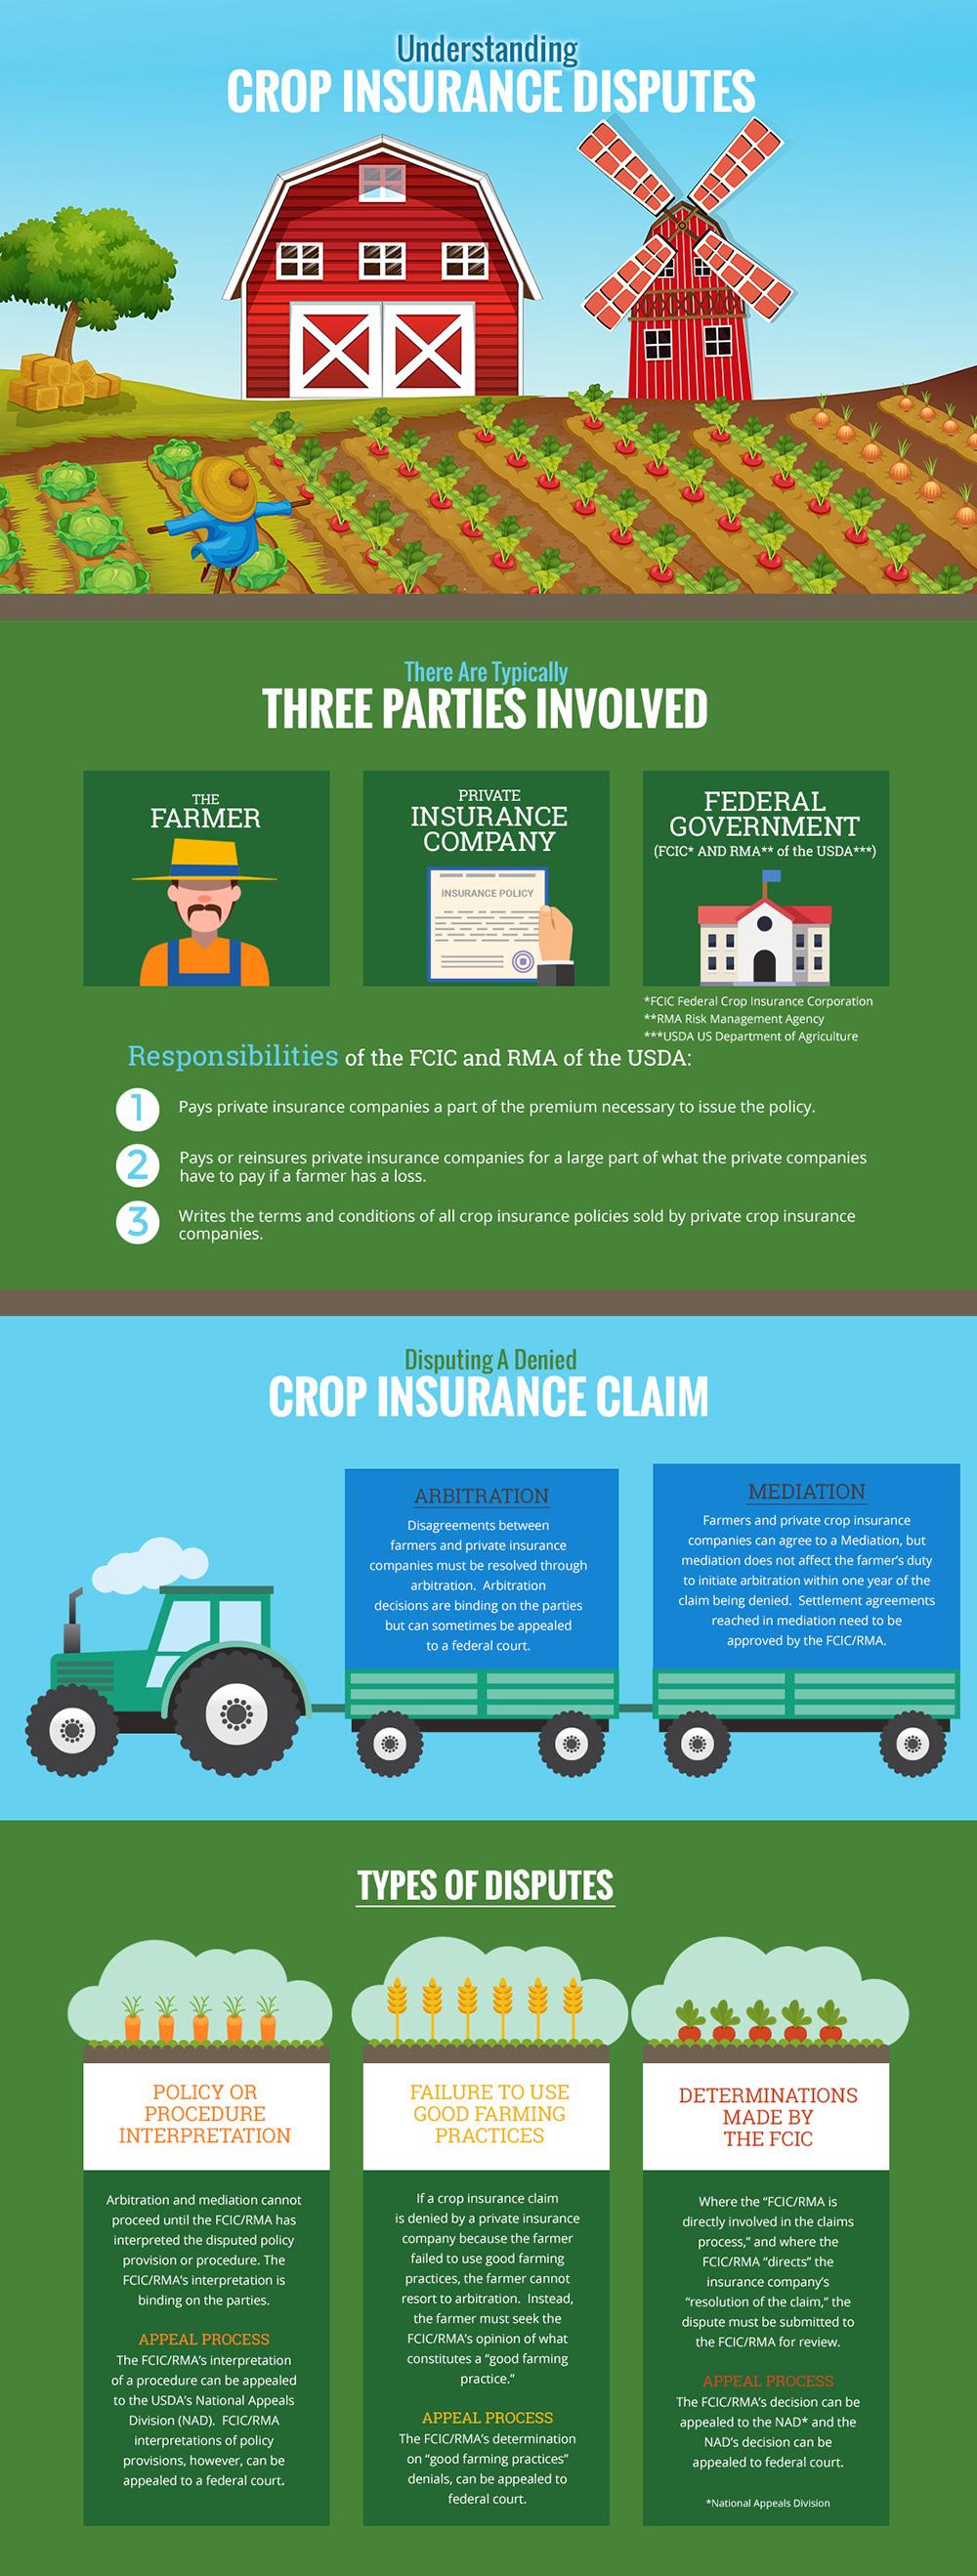 Crop Insurance Disputes Attorney